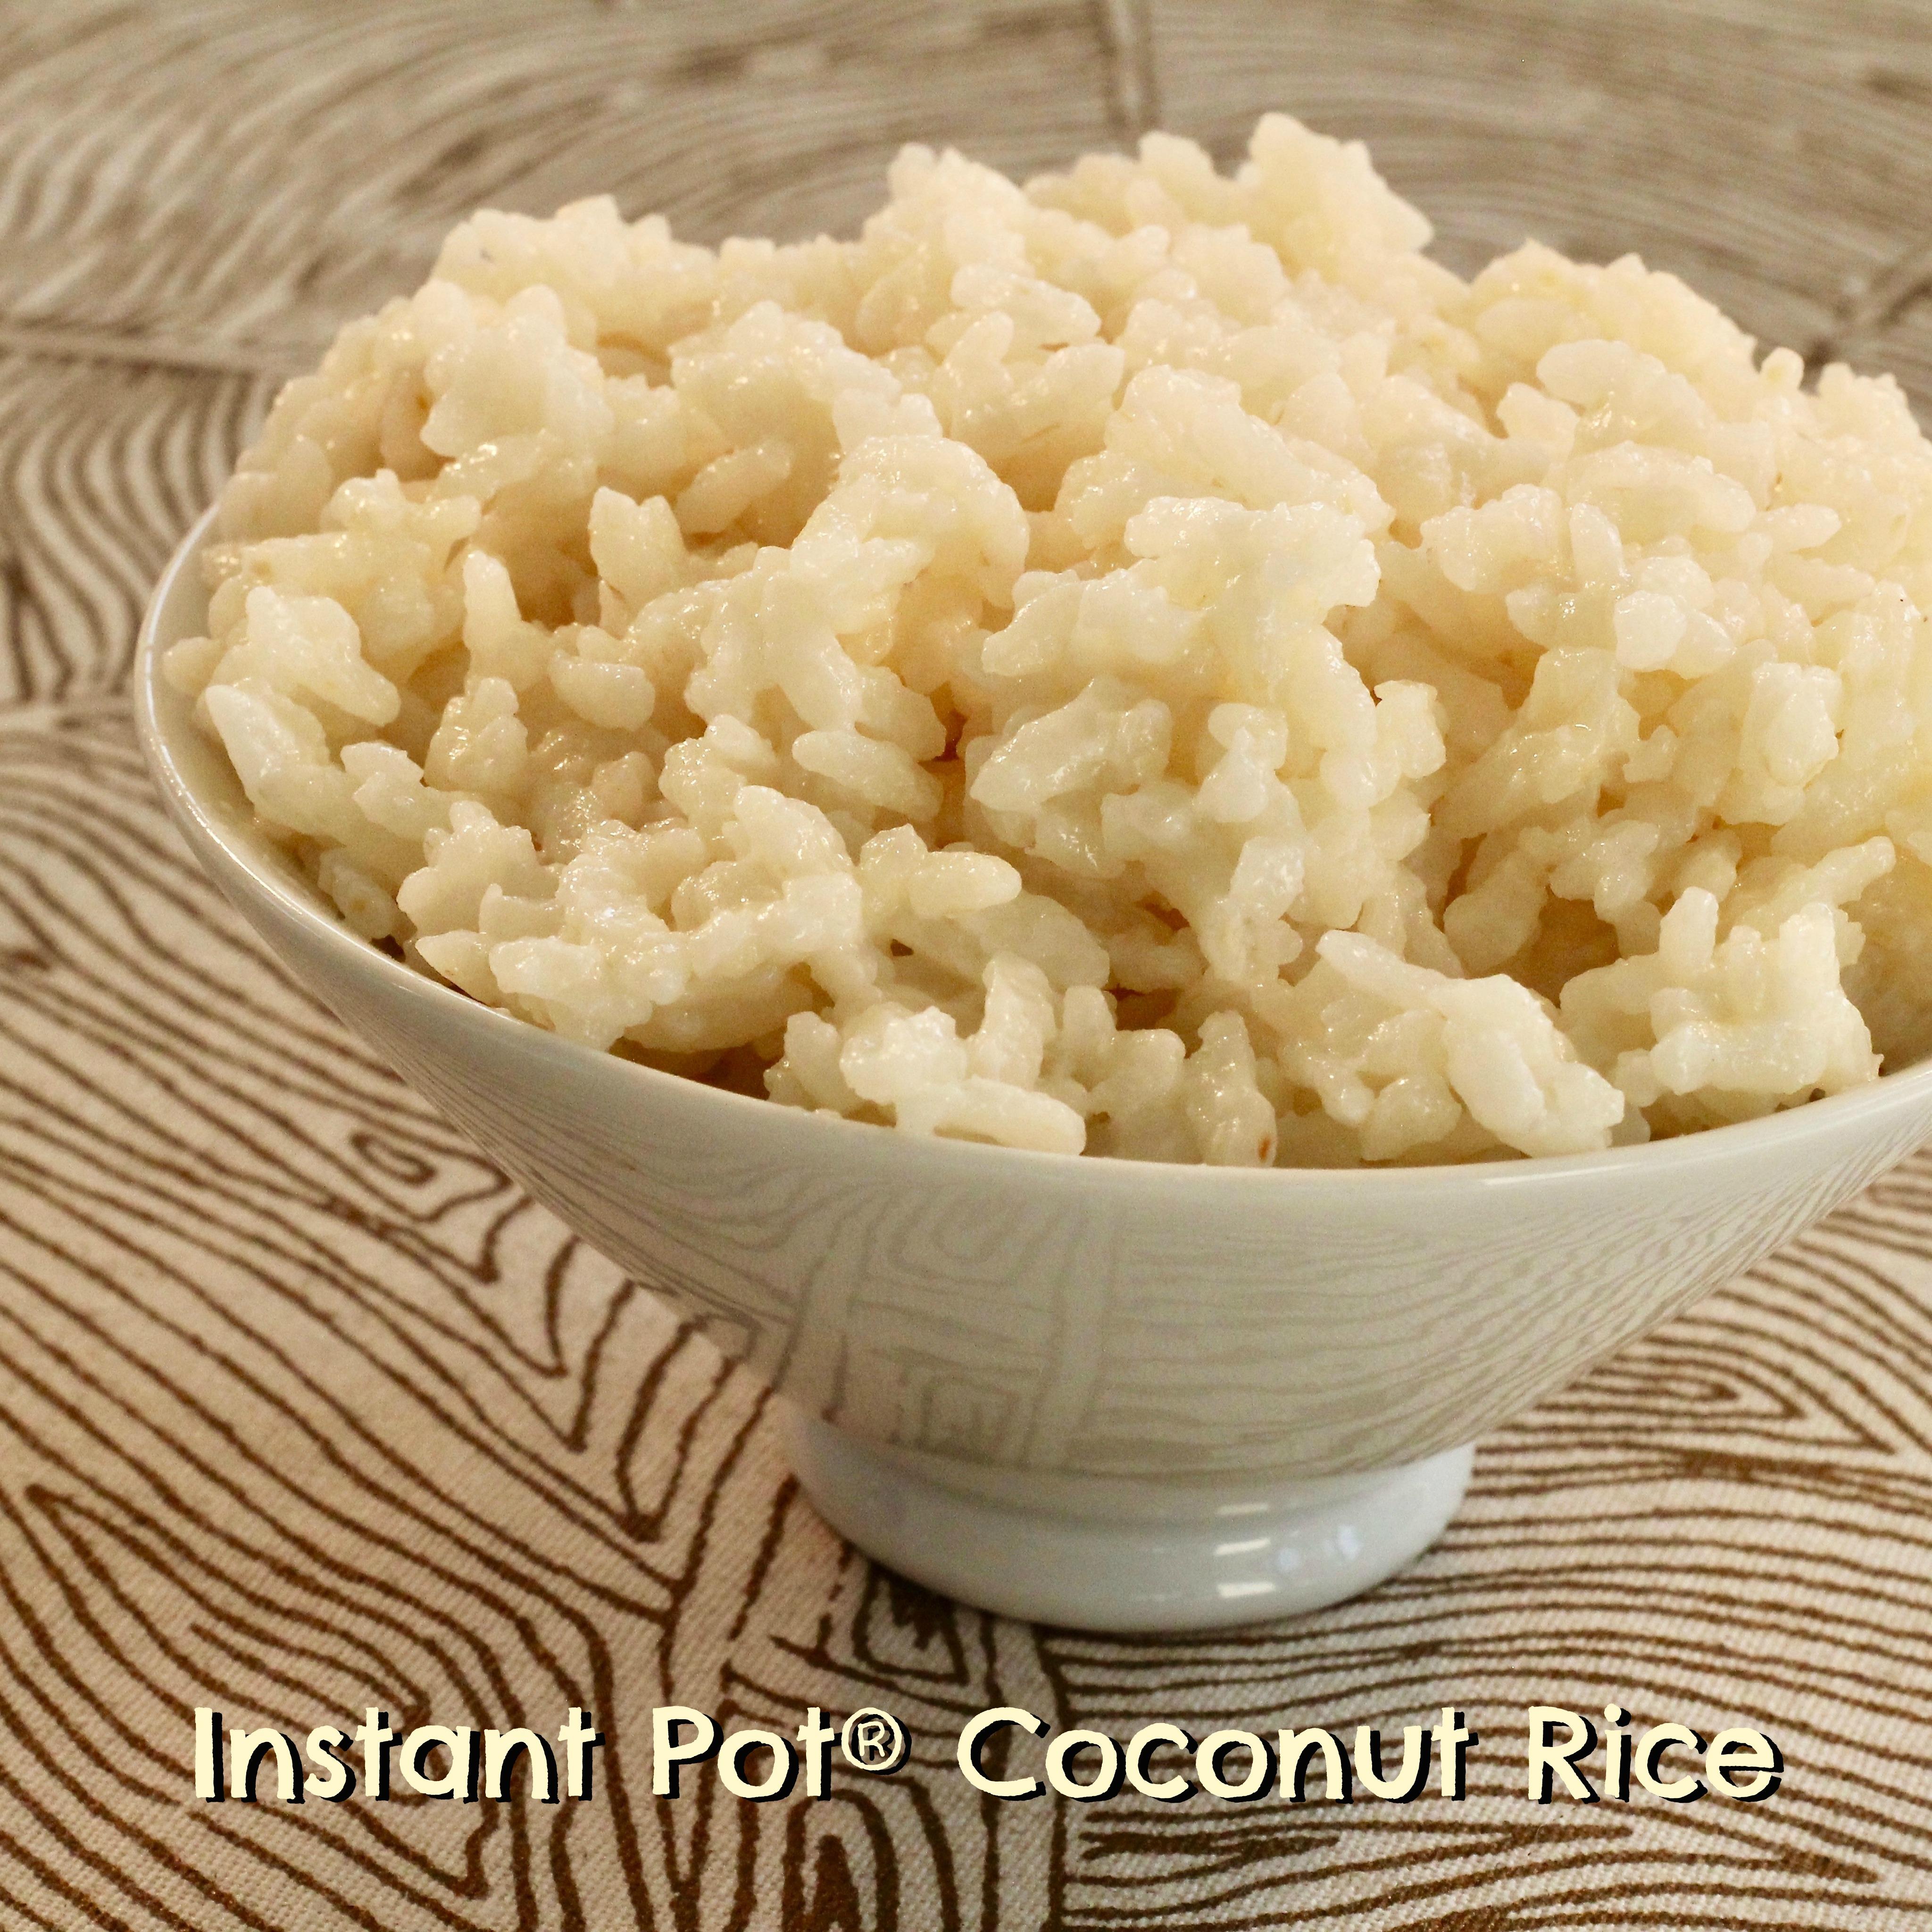 Instant Pot® Coconut Rice lutzflcat